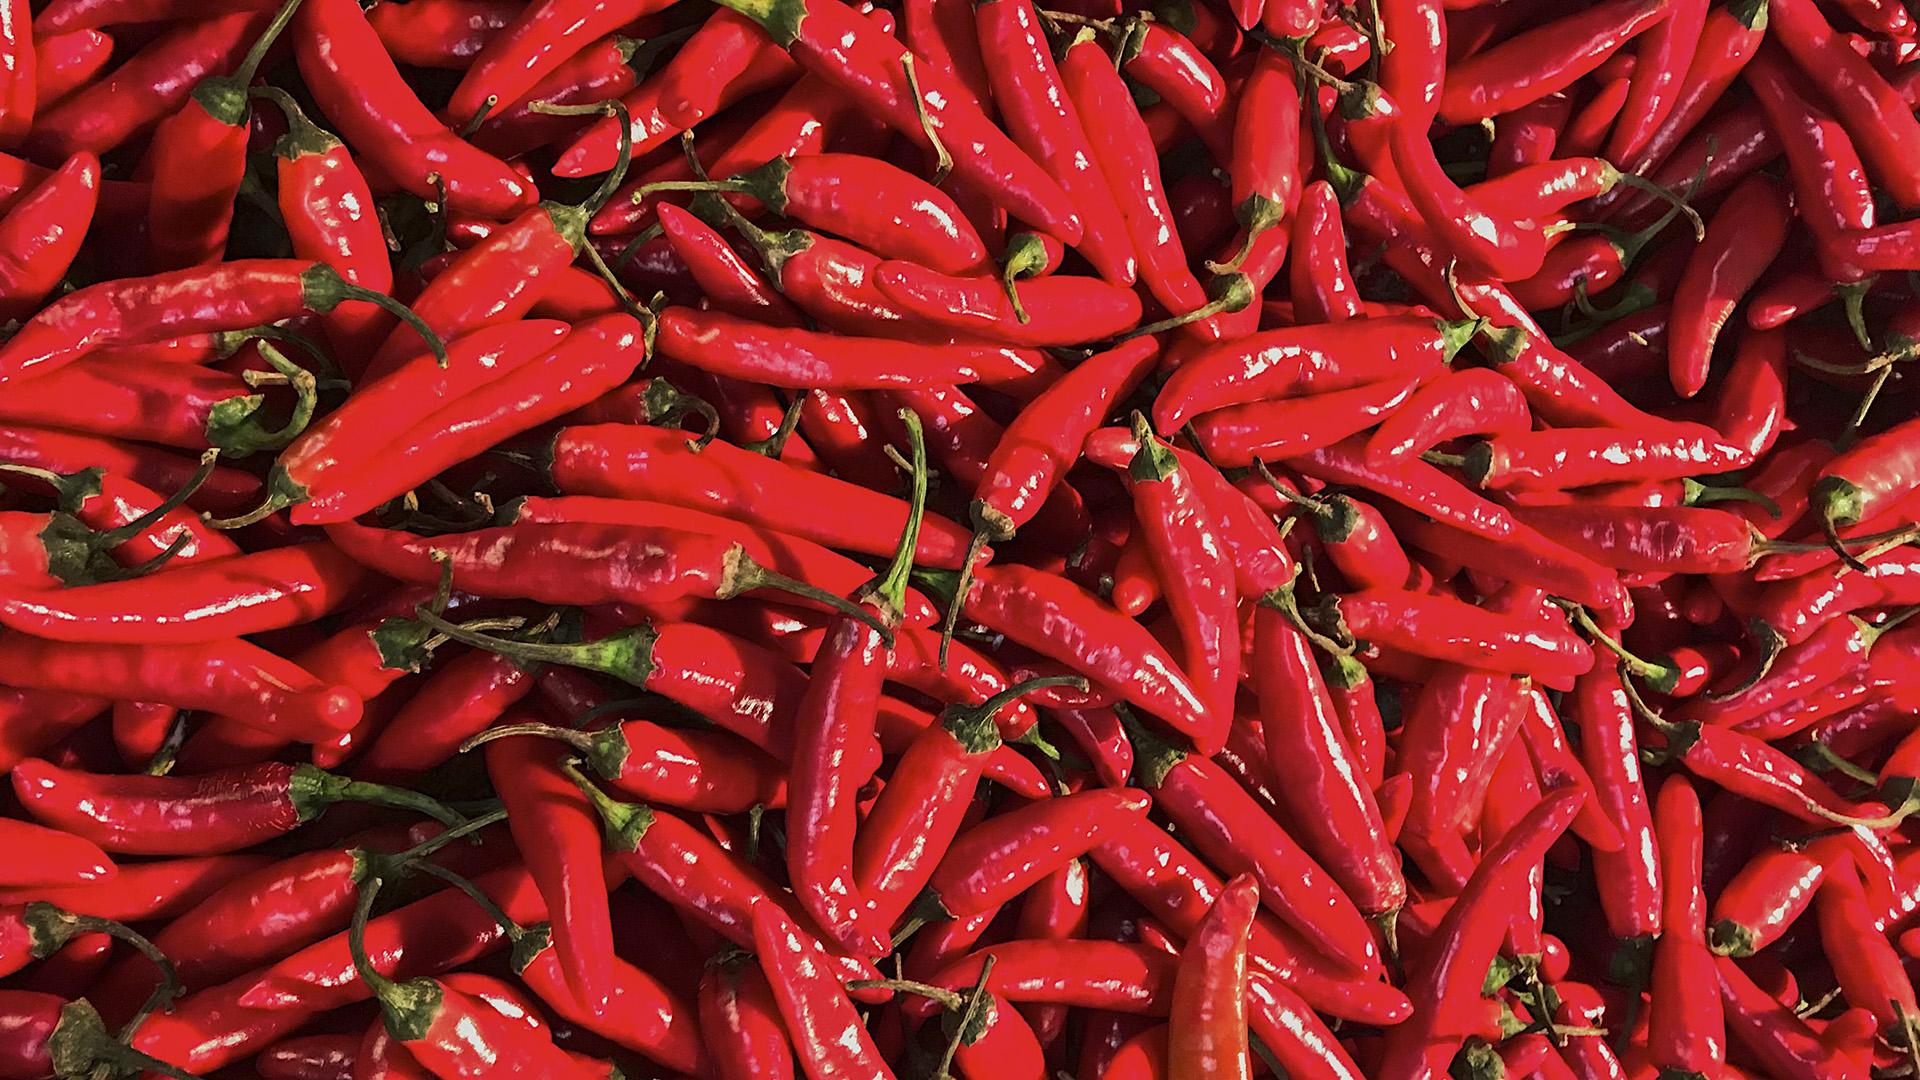 China-Pakistan Economic Corridor To Expand Chili Farming